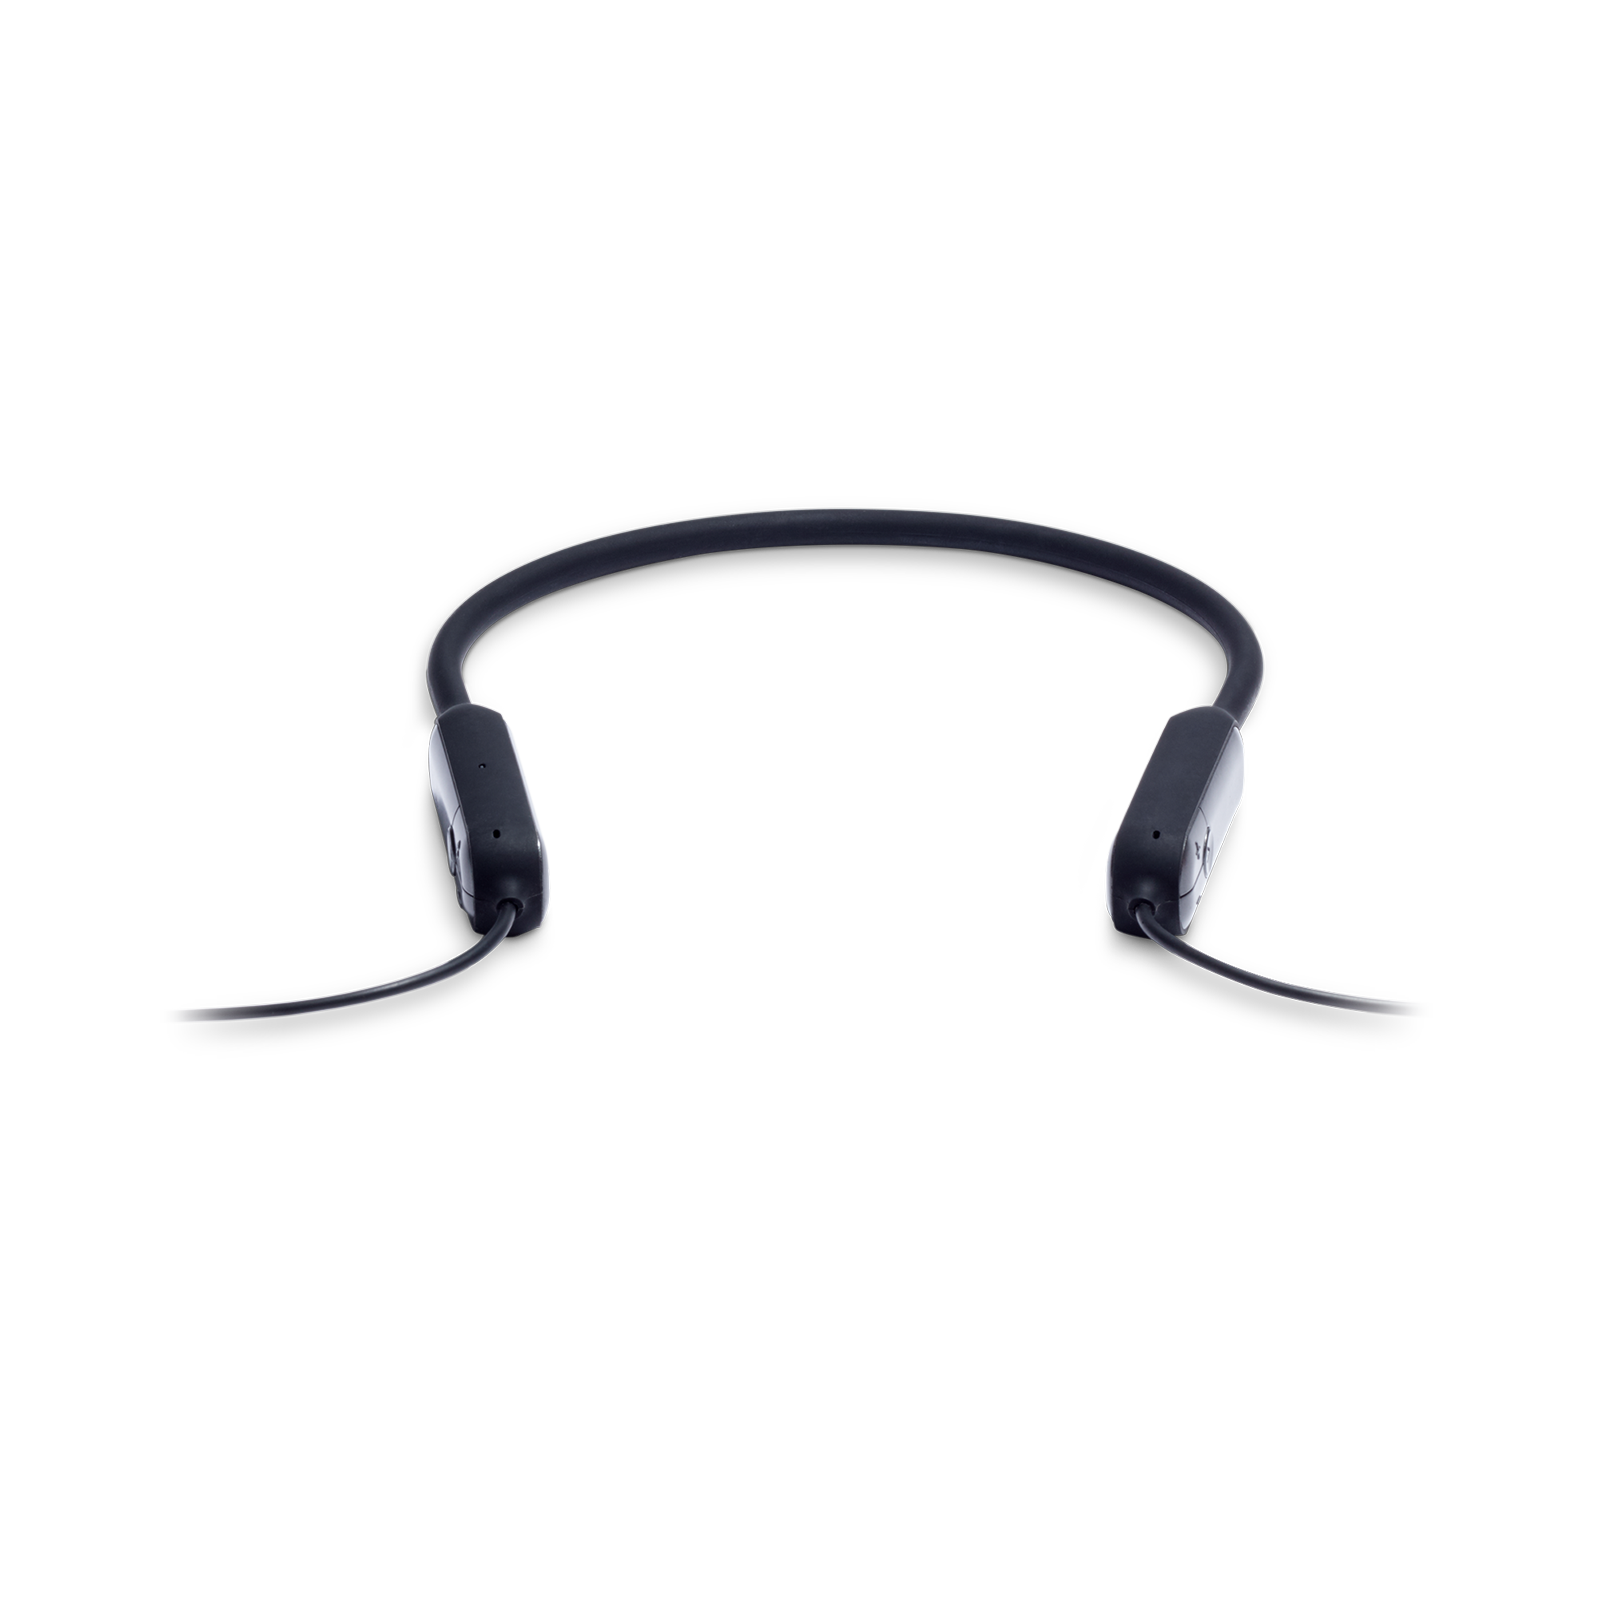 JBL EVEREST™ ELITE 150NC - Gun Metal - Wireless In-Ear NC headphones - Detailshot 5